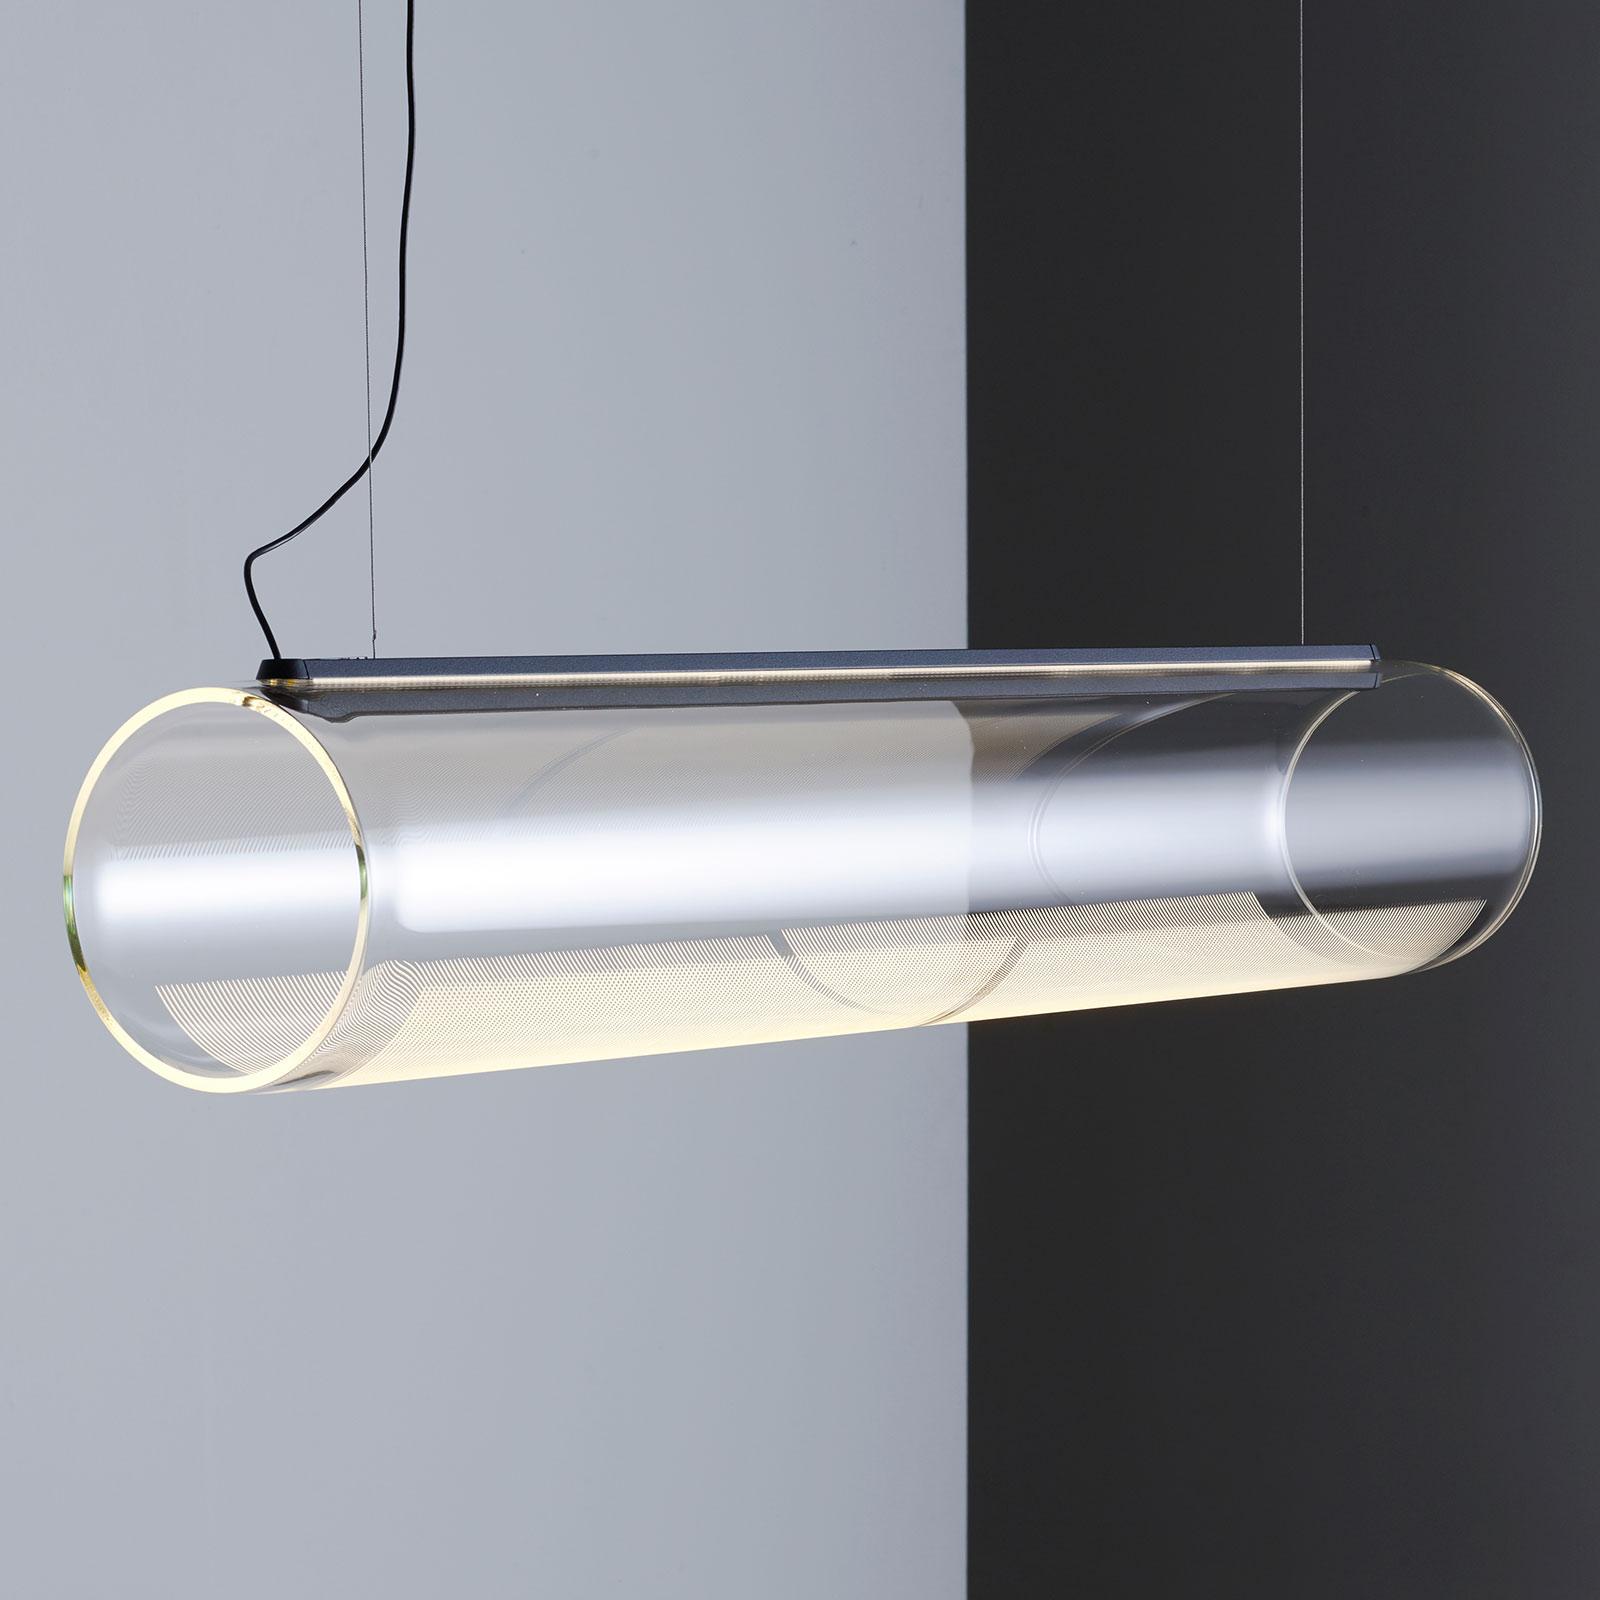 Vibia Guise 2277 Lampa wisząca LED, długość 89 cm